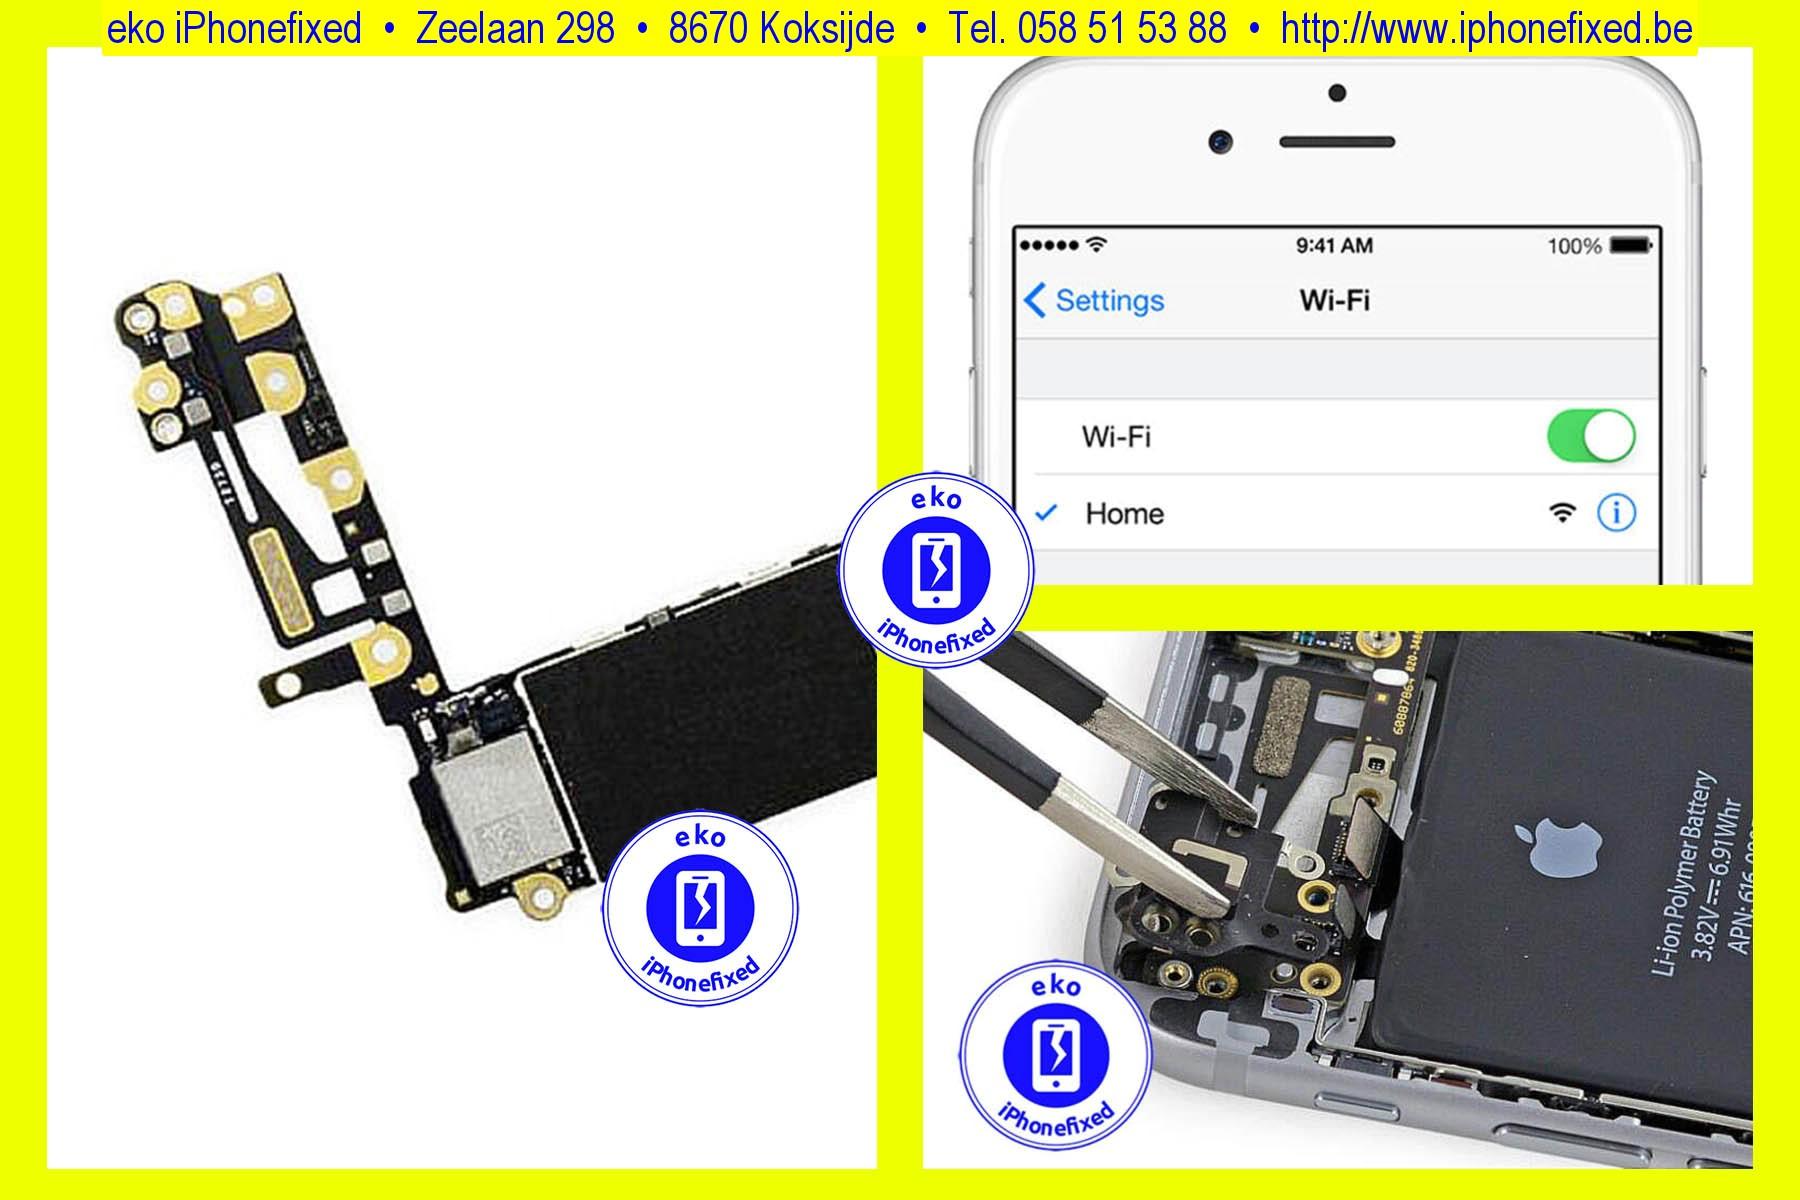 apple iphone 6 wifi antenne reparatie eko iphonefixed-4